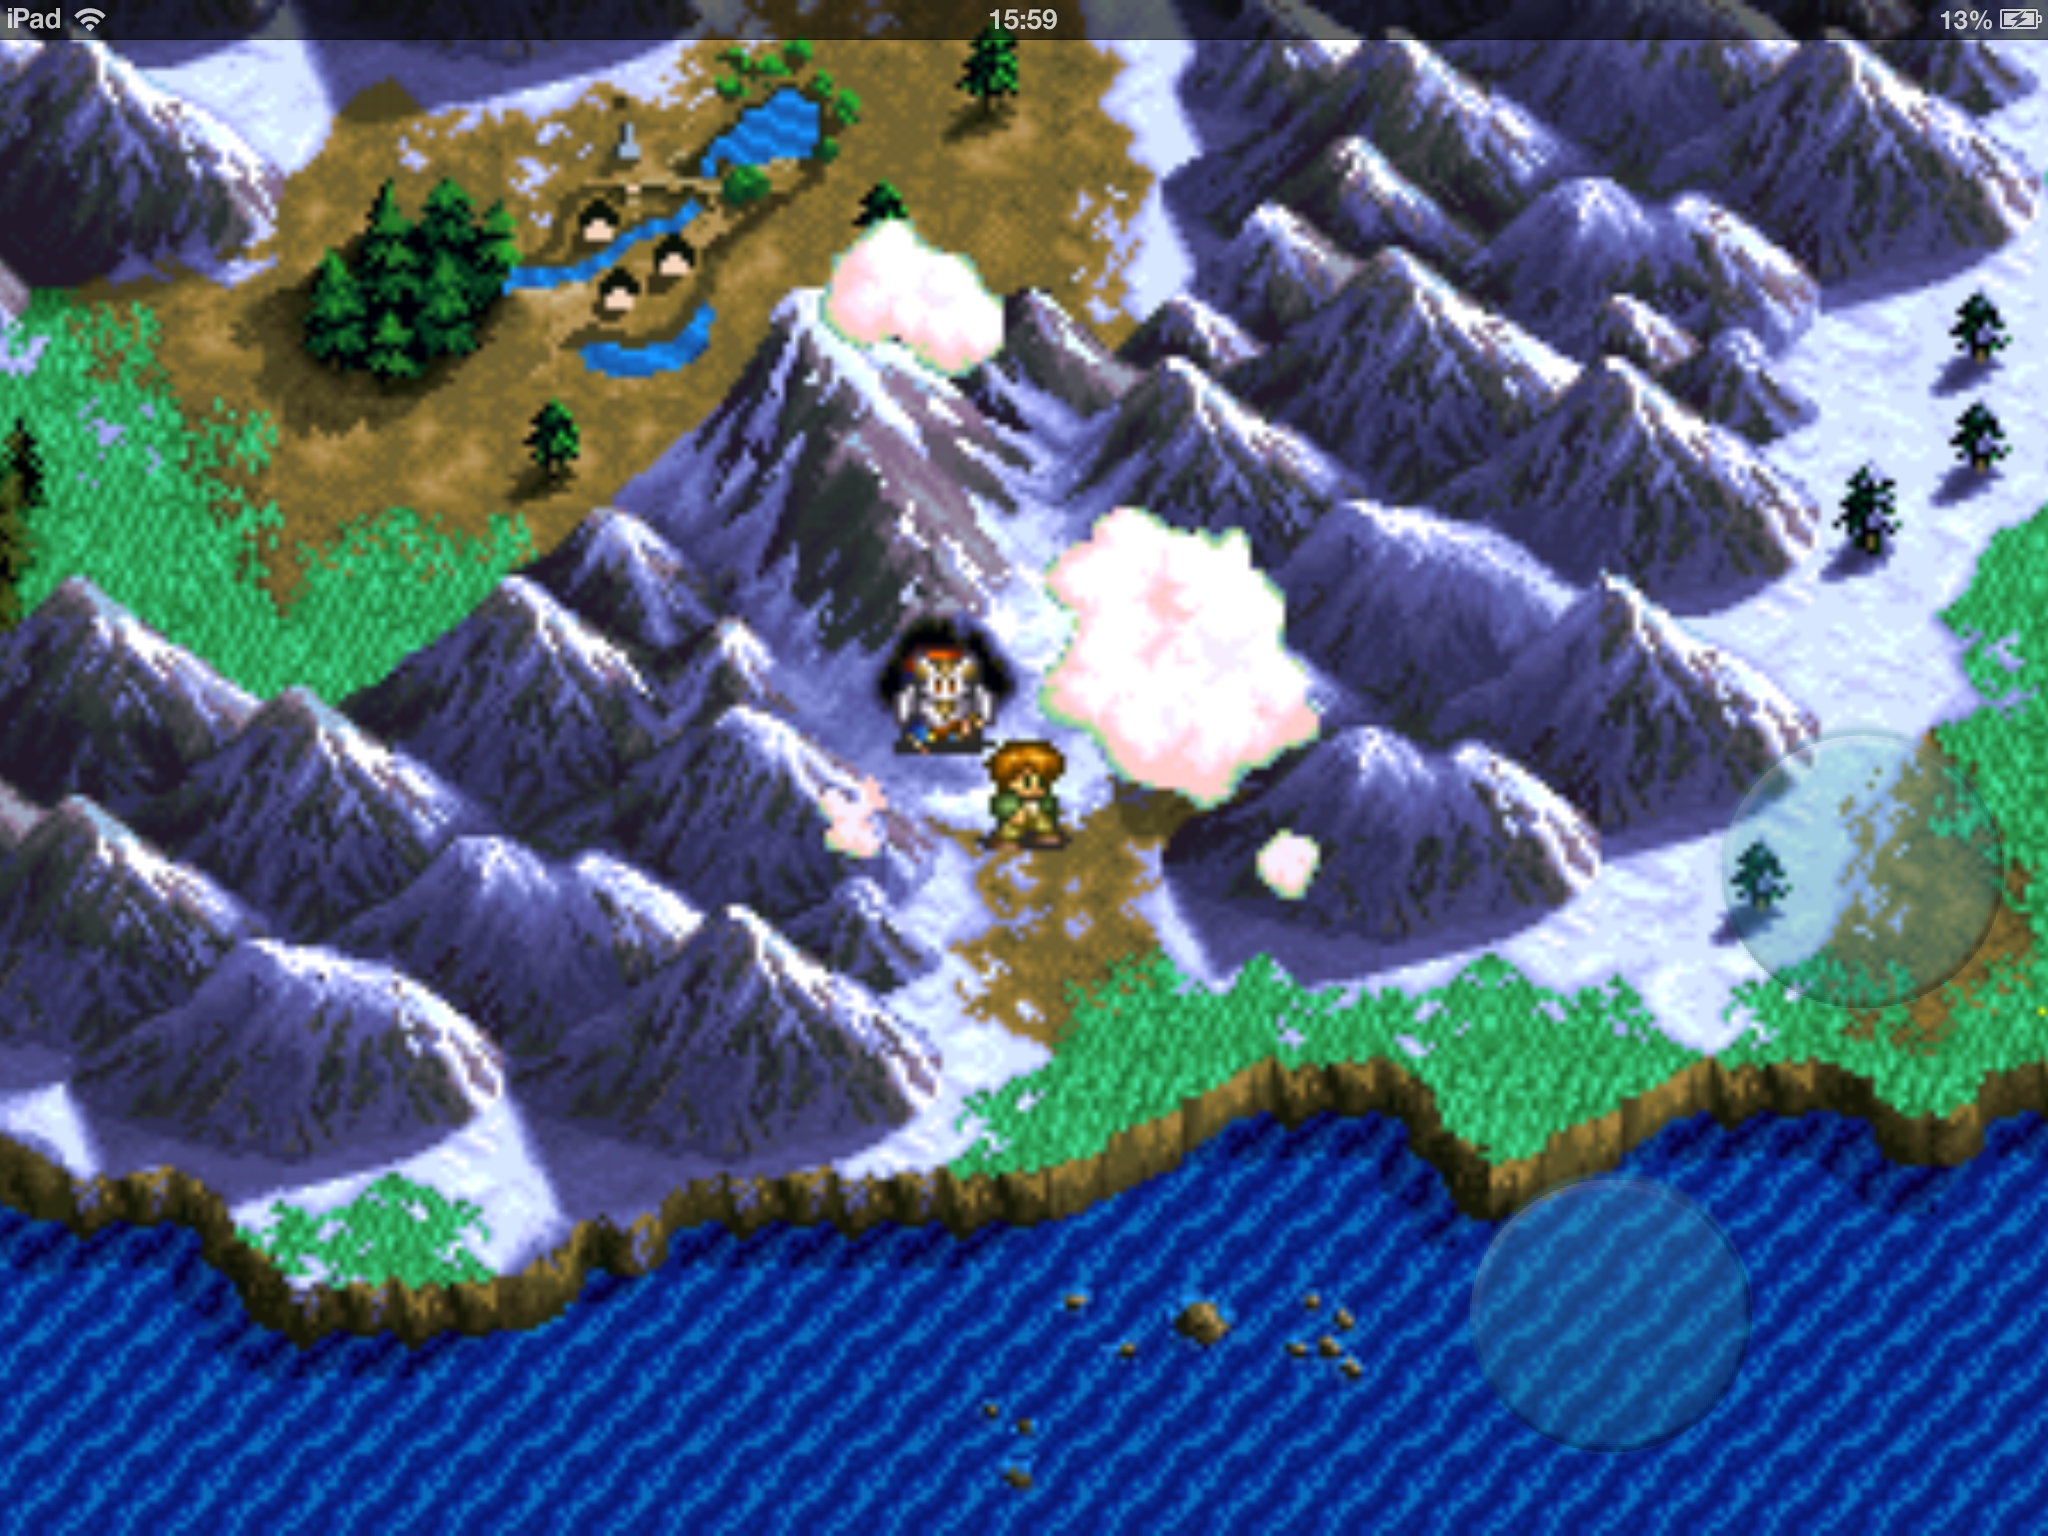 Sponsored Feature: SoMoGa on resurrecting RPG Lunar for iOS